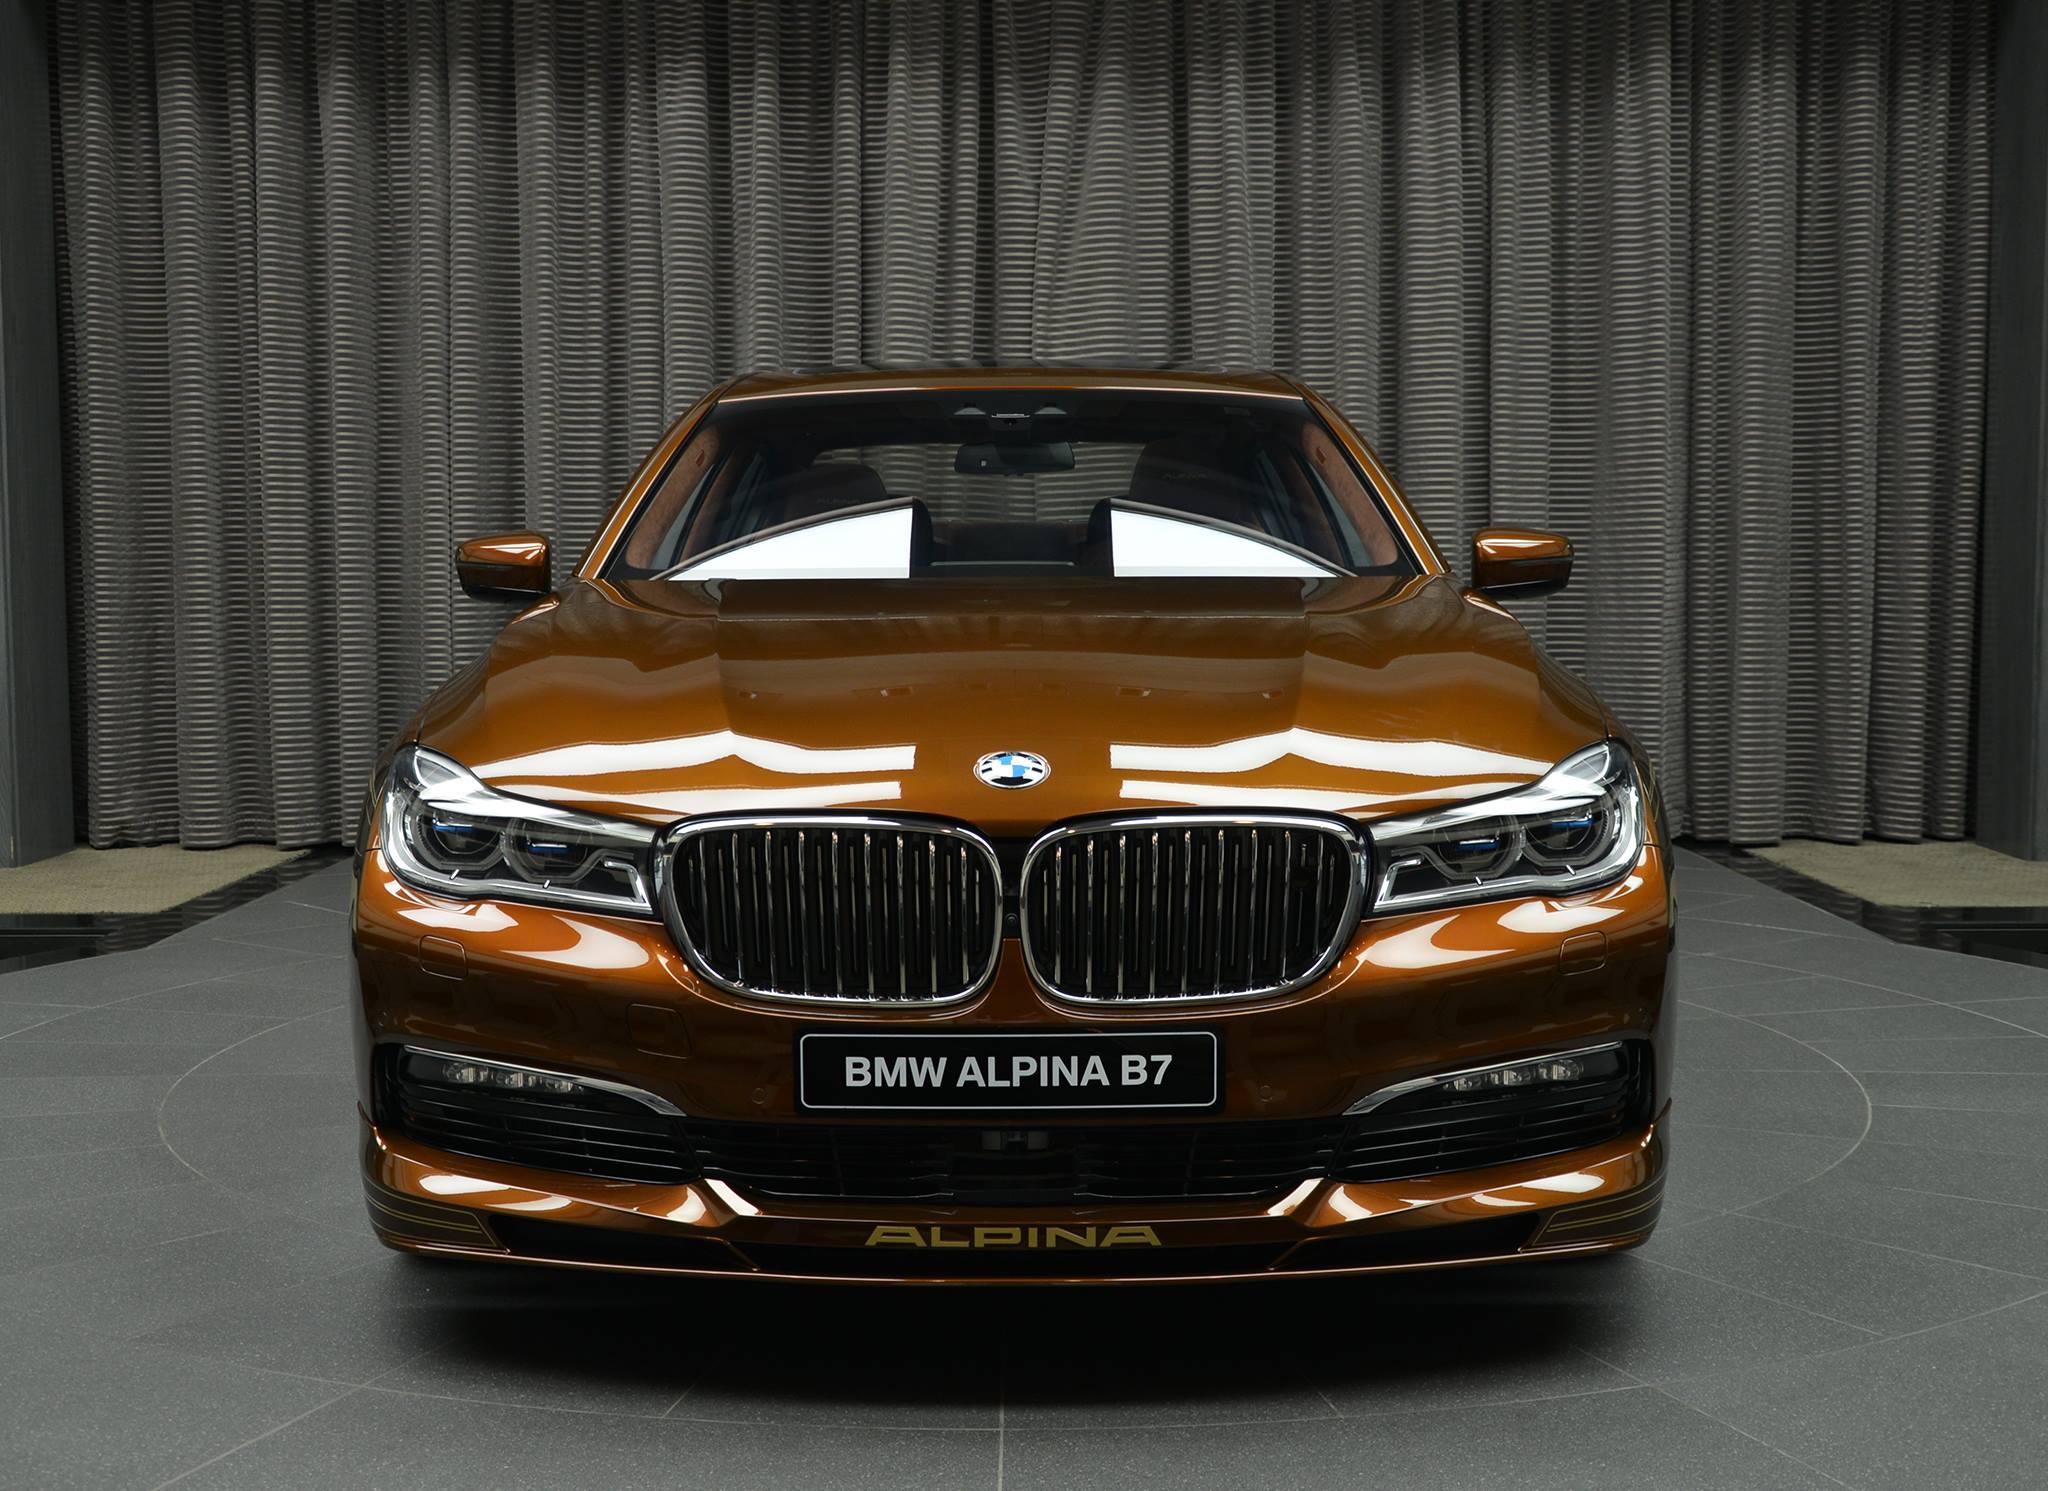 Chestnut Bronze Alpina B7 Bi Turbo Has Matching Brown Interior Autoevolution